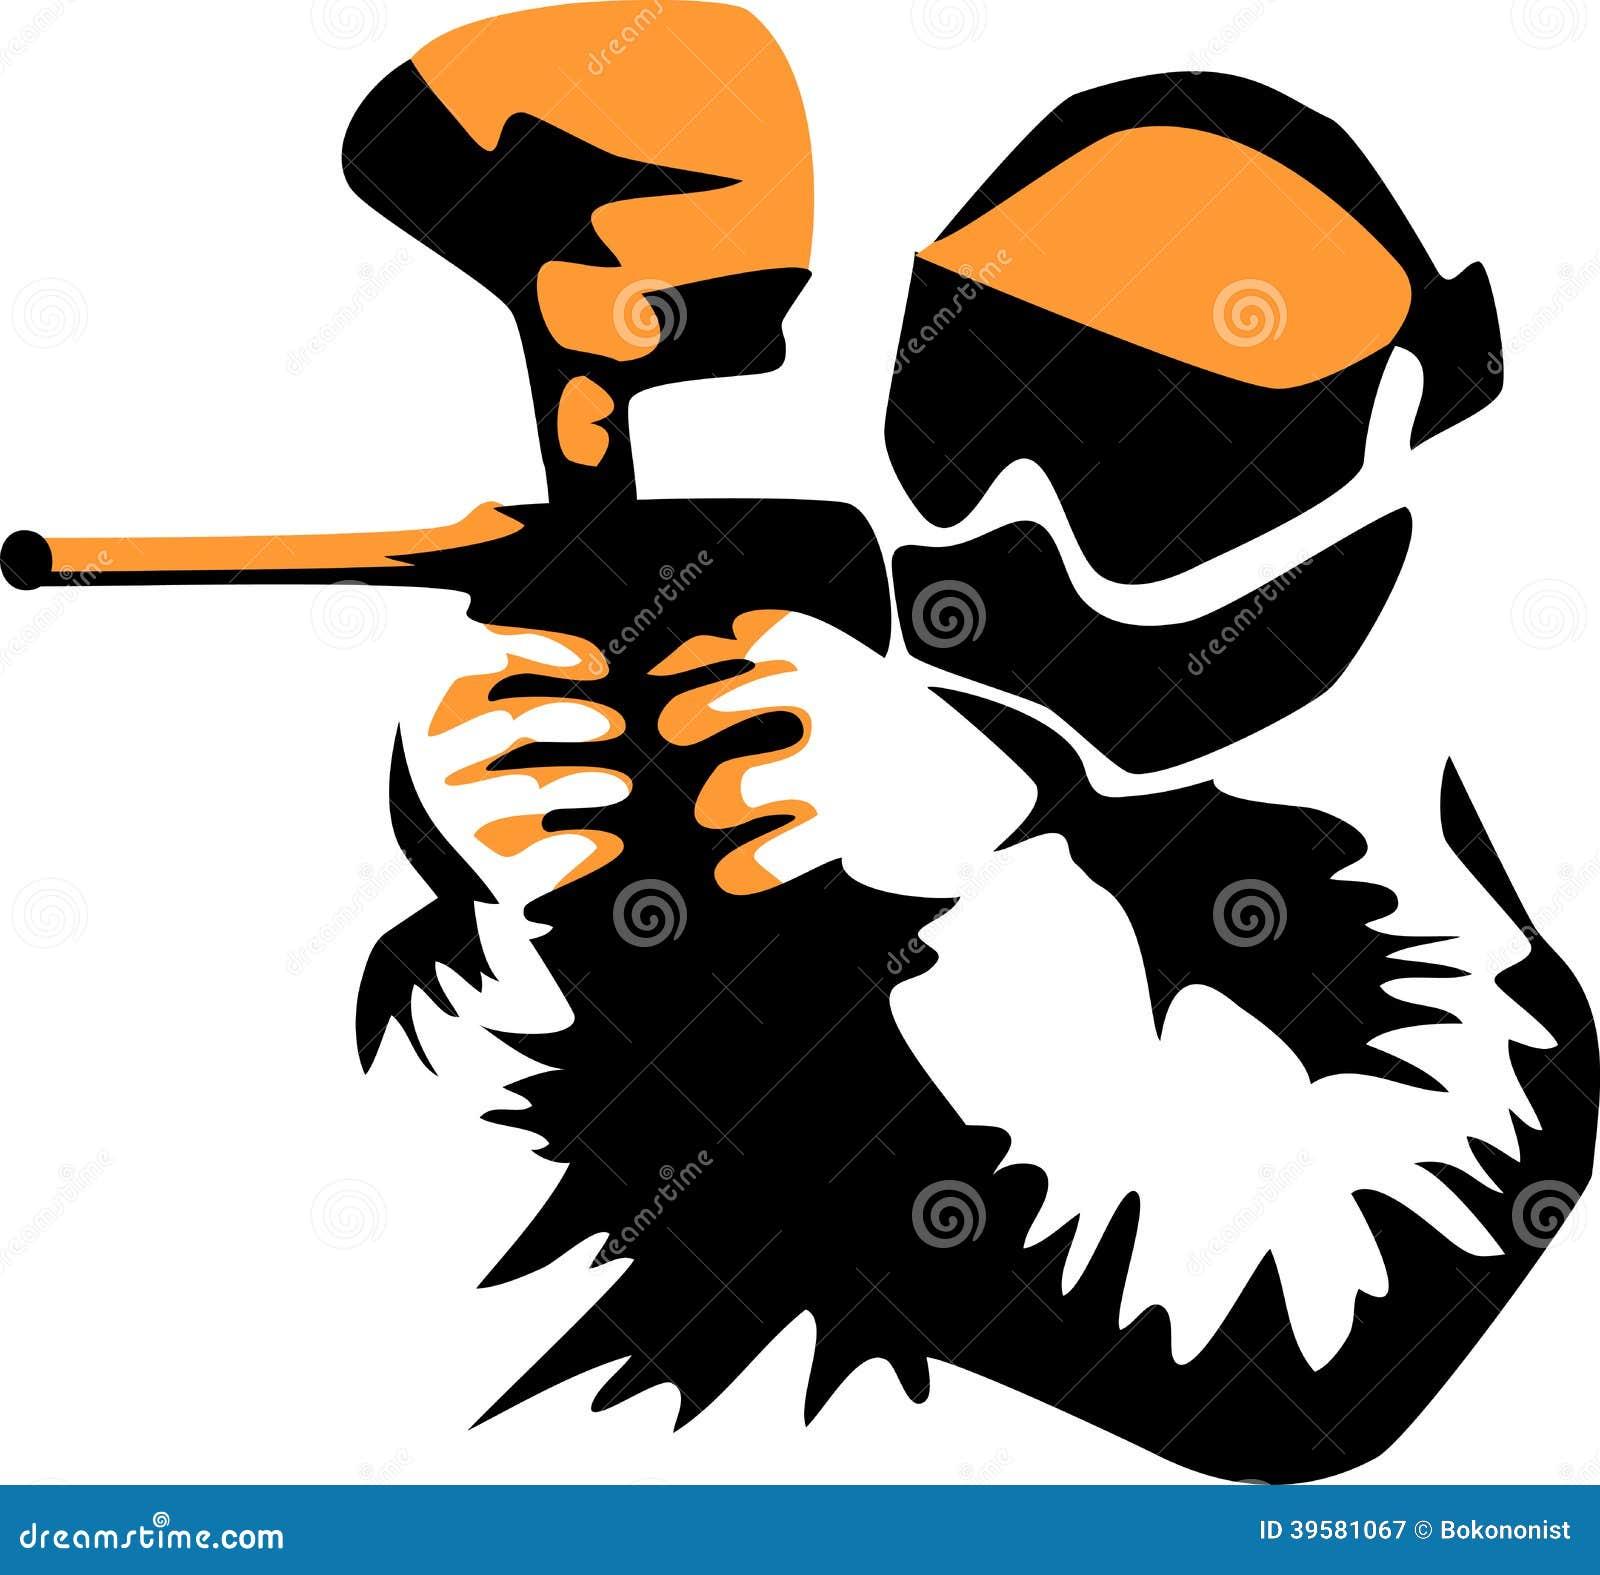 Paintball player - stylized black and orange illustration